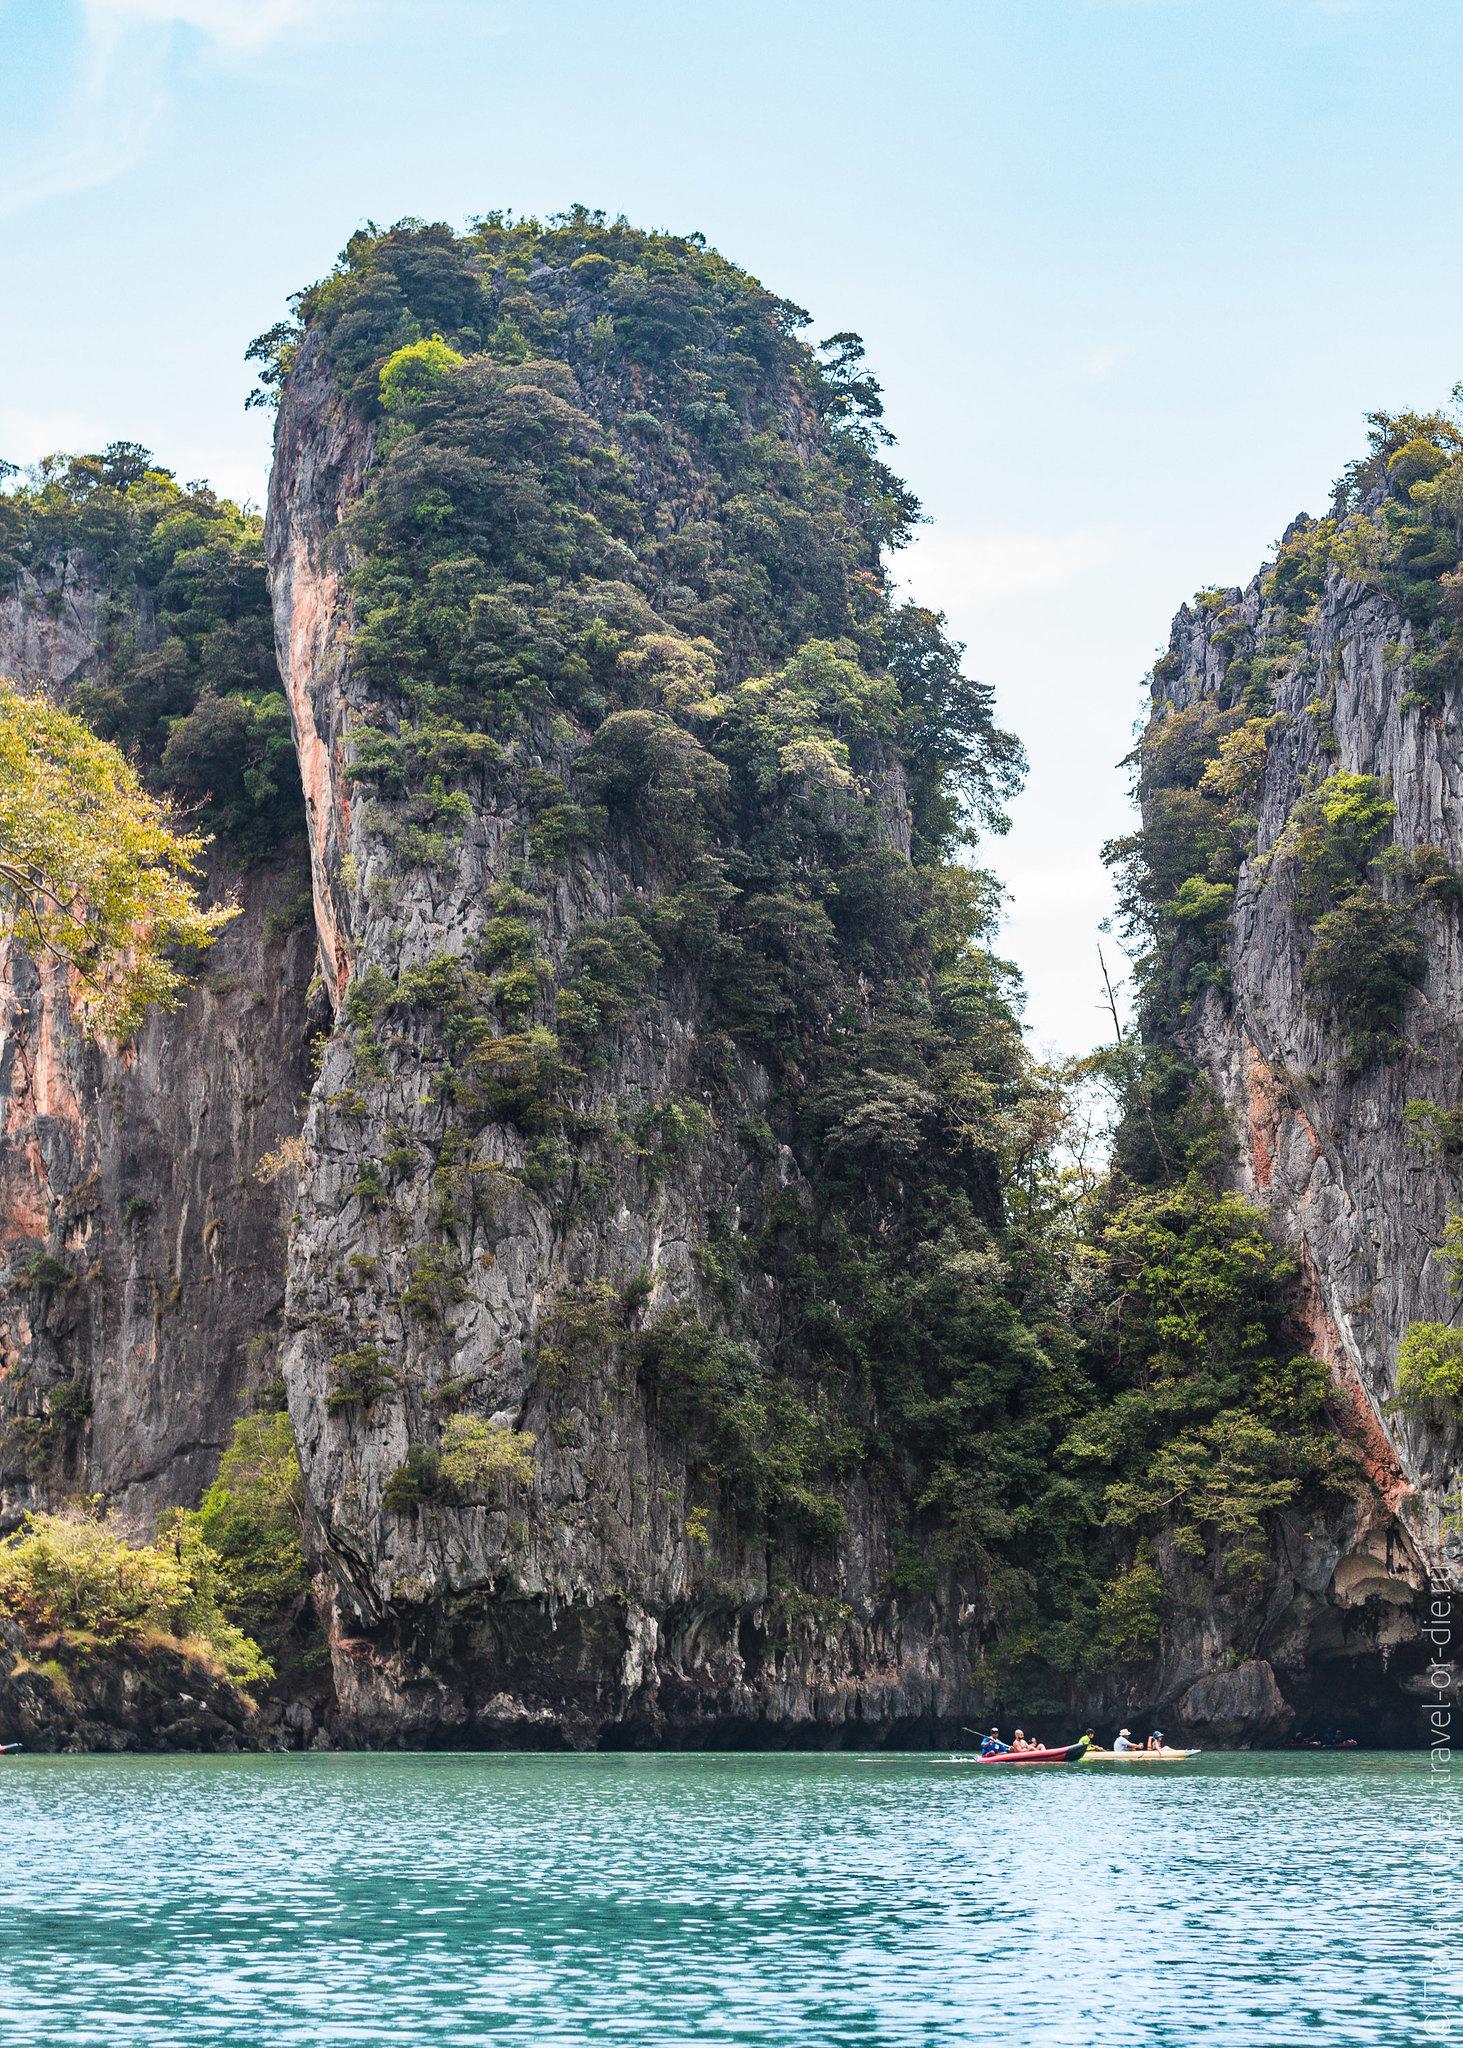 Hong-Island-Остров-Хонг-Phang-Nga-Thailand-9105